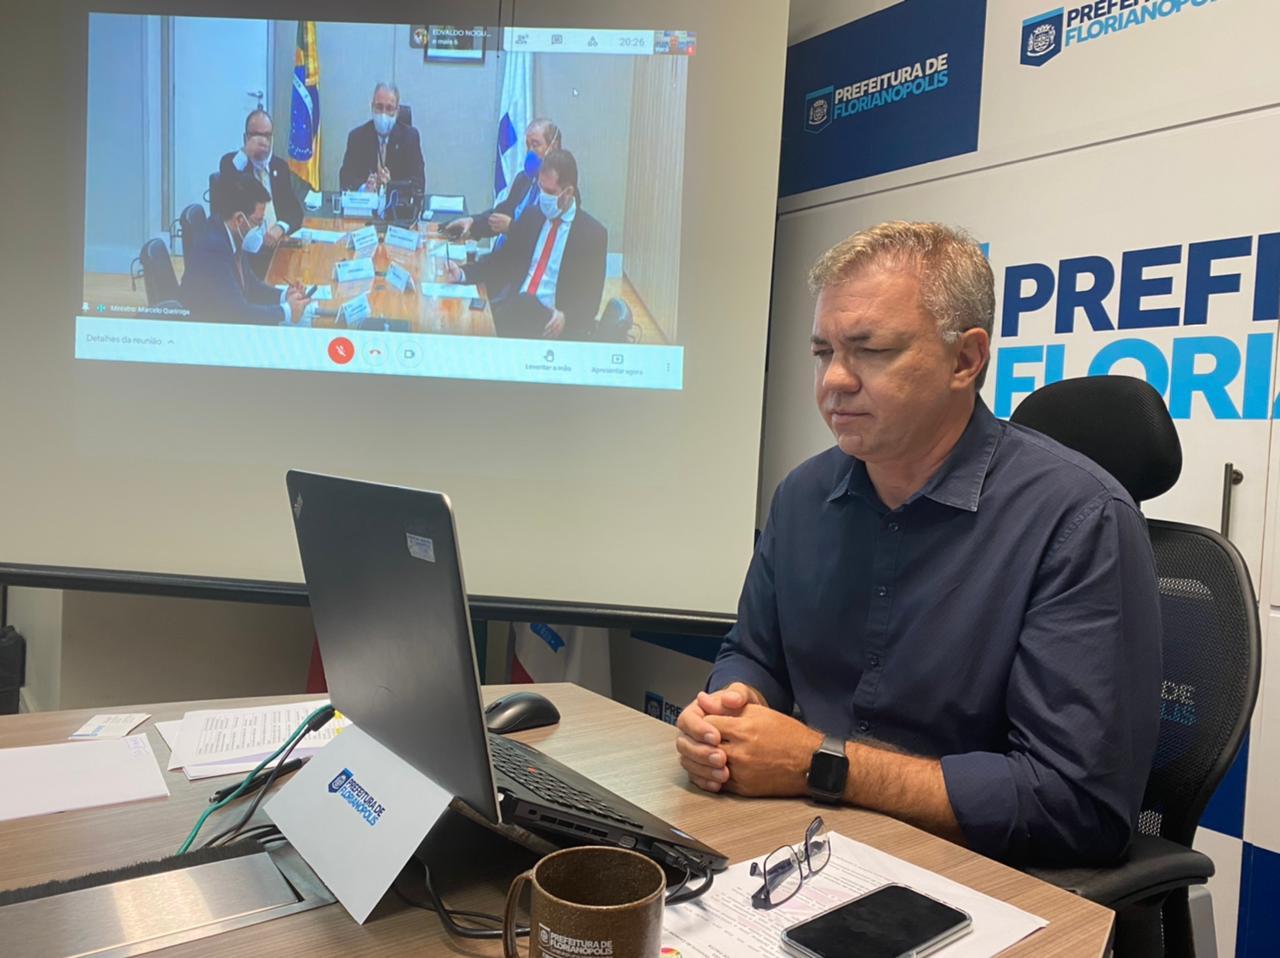 Prefeito de Florianópolis, Gean Loureiro, toma posse e comandará maior consórcio do Brasil para compra de vacinas da Covid-19